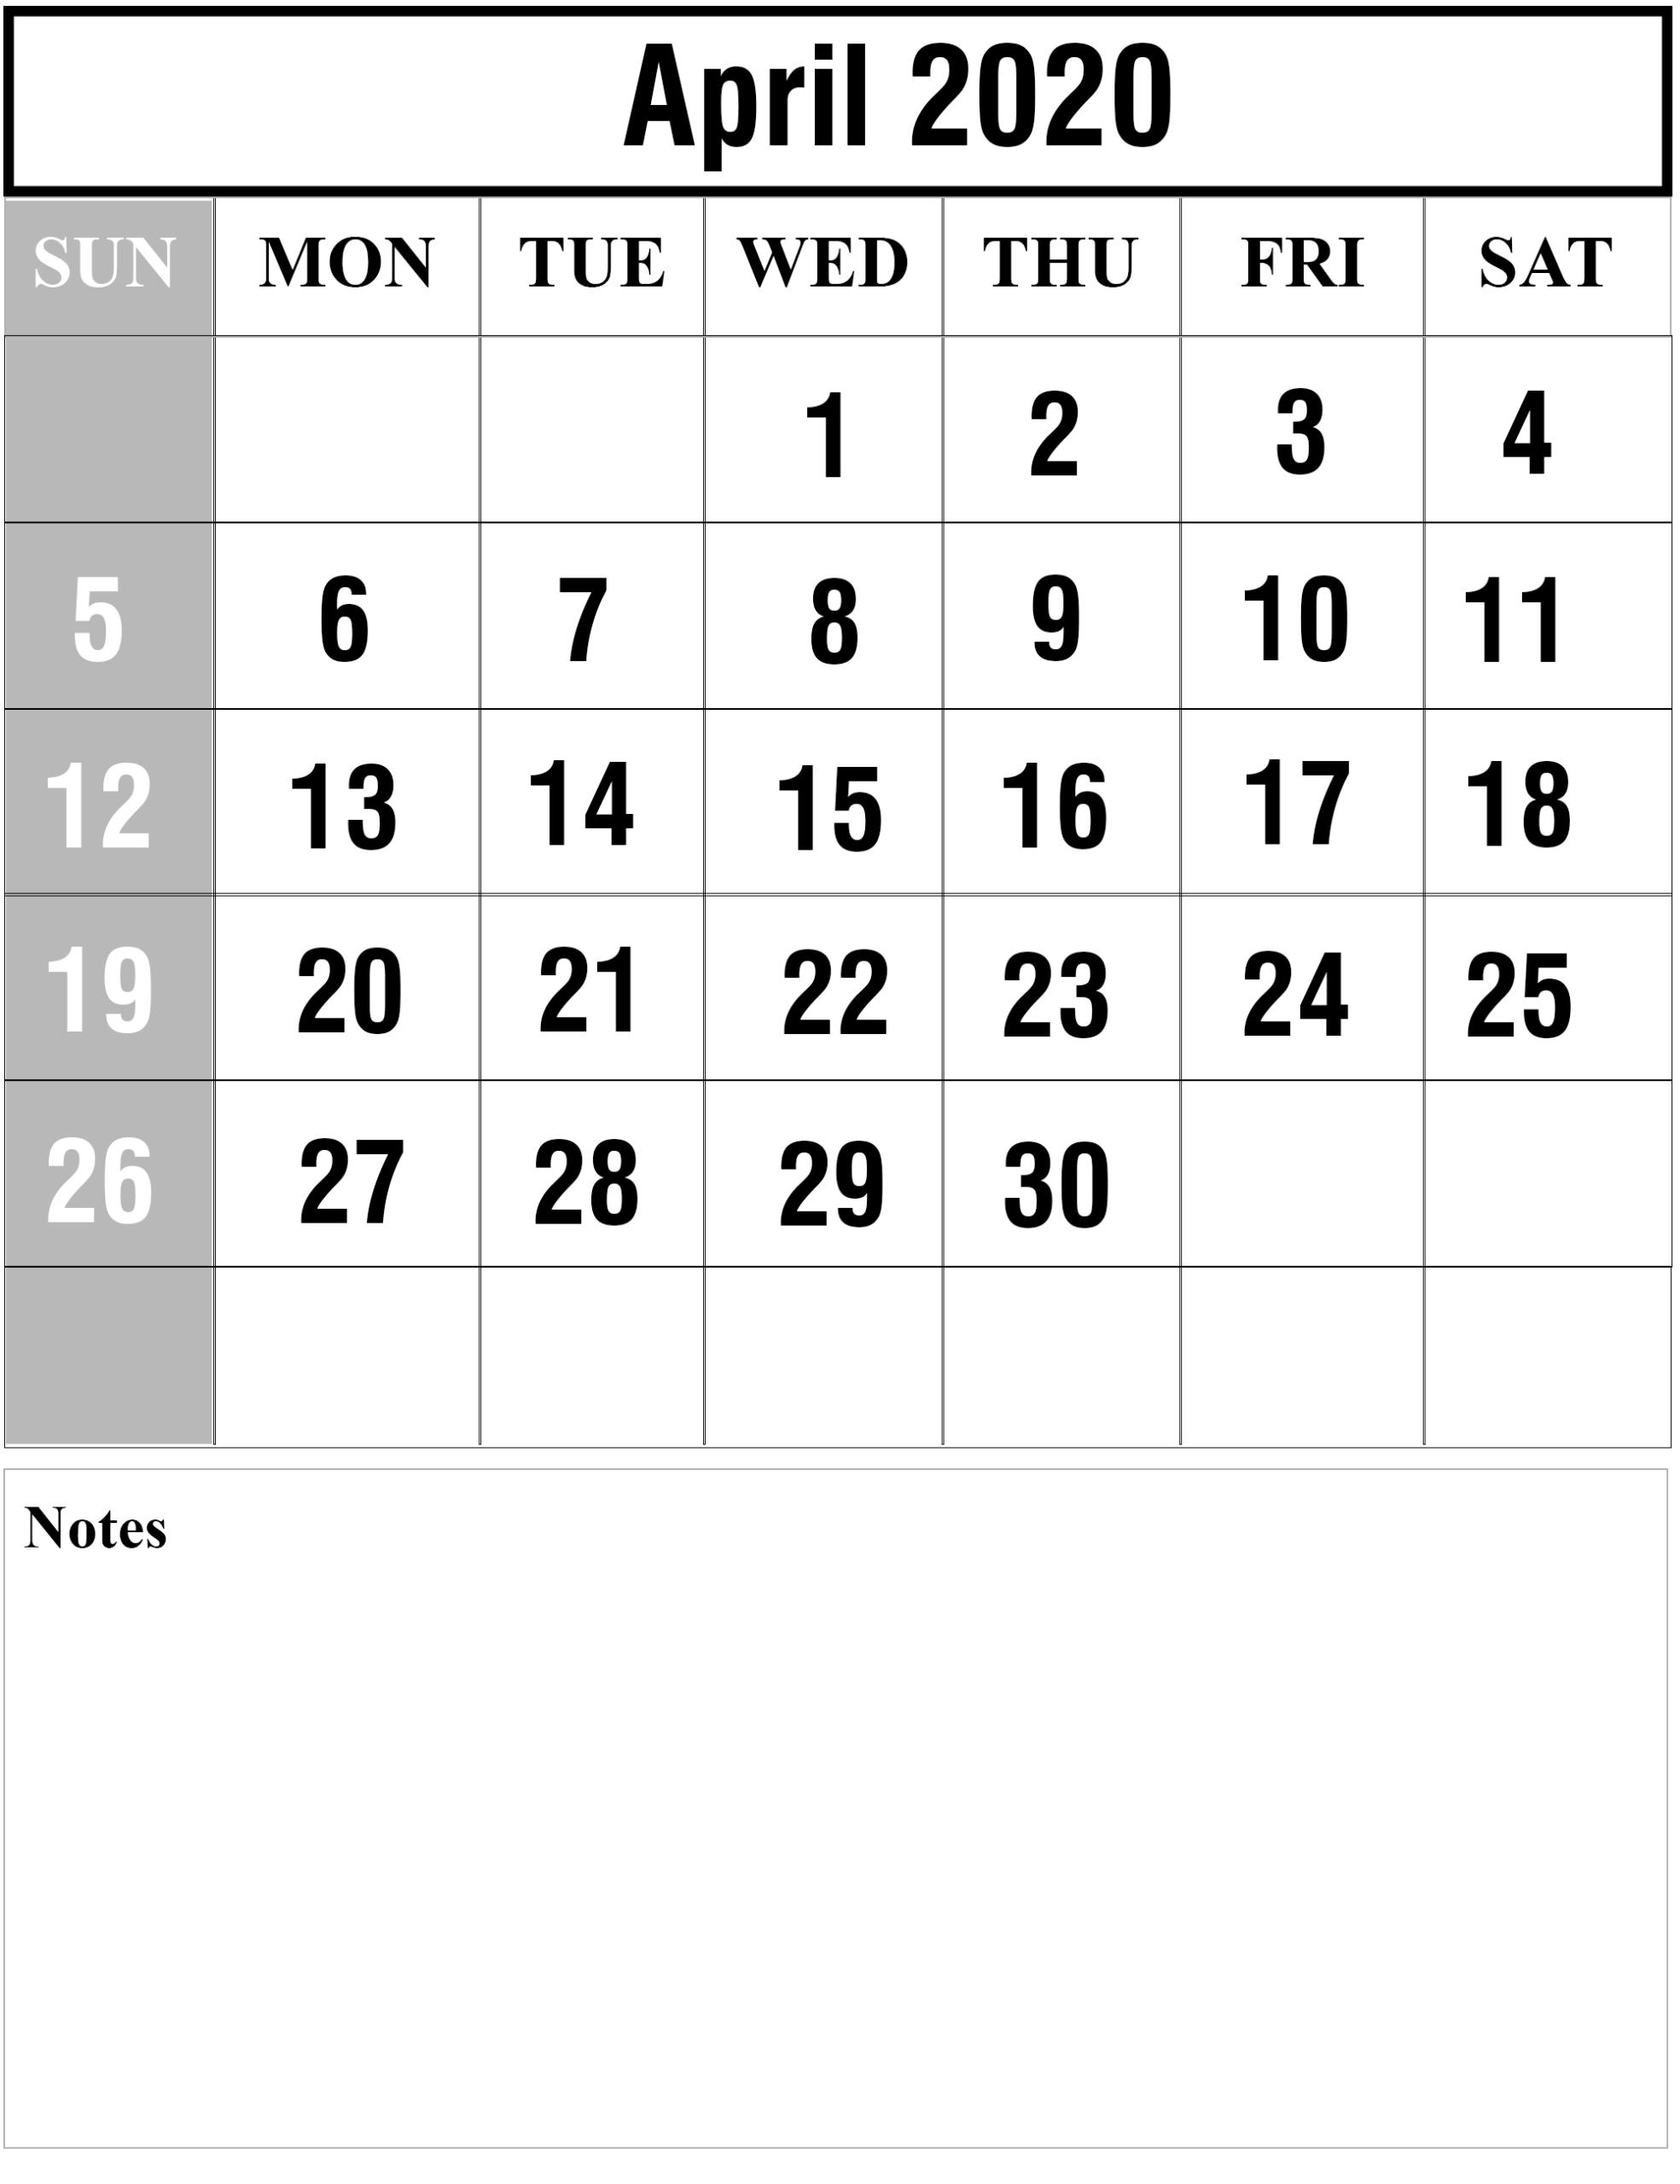 W 8 Form 2020 Printable | Example Calendar Printable